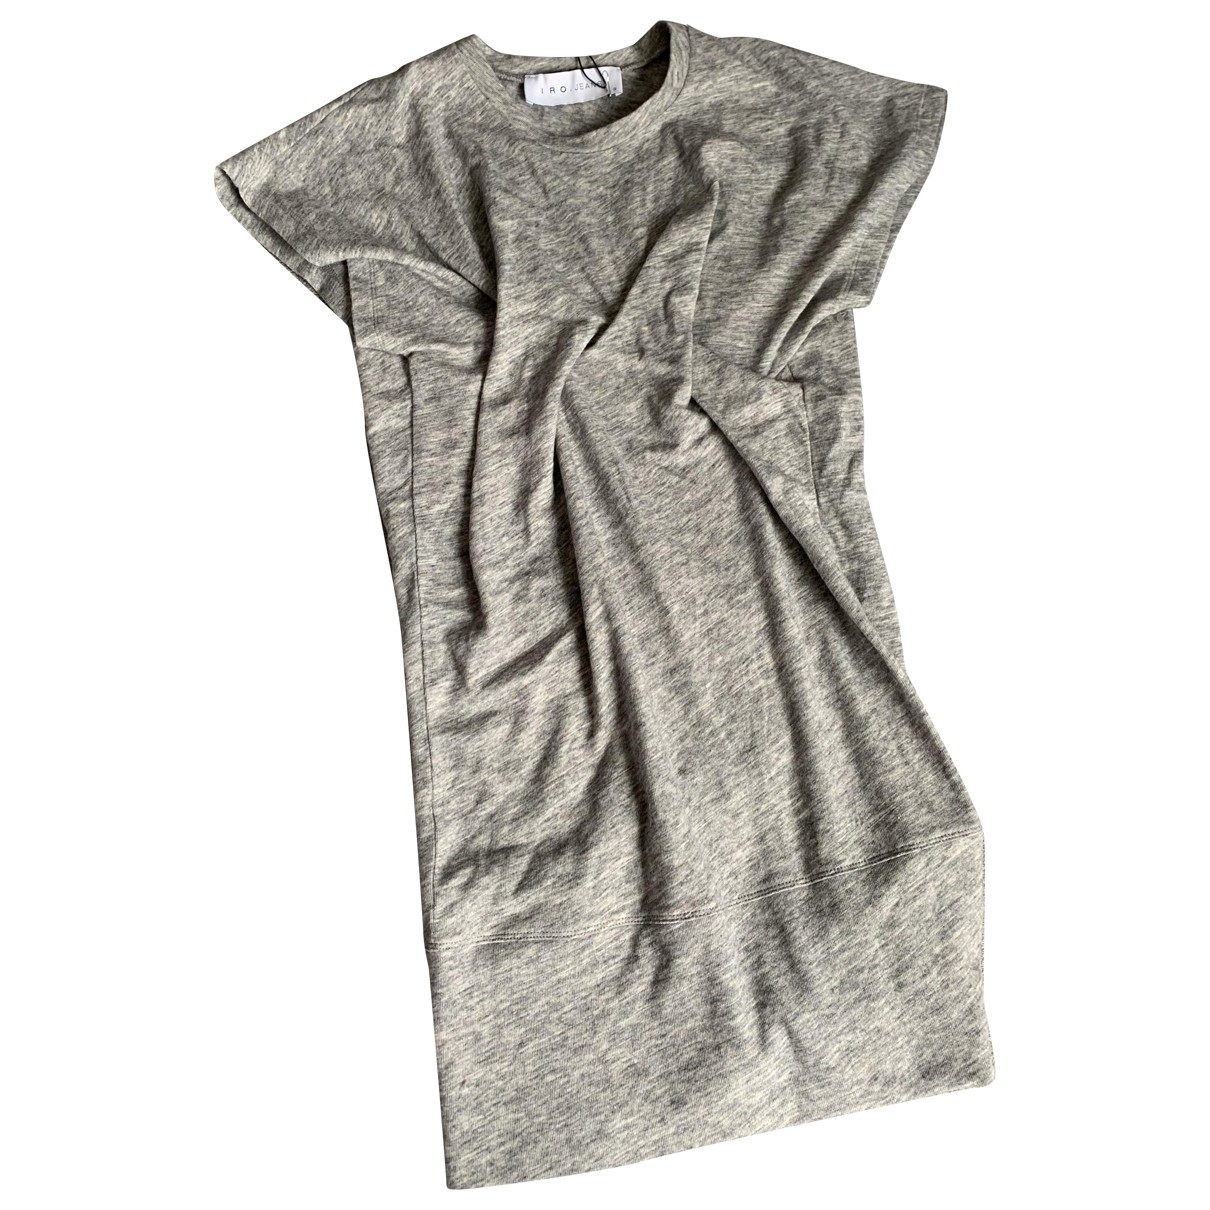 Iro \N Grey Cotton dress for Women S International